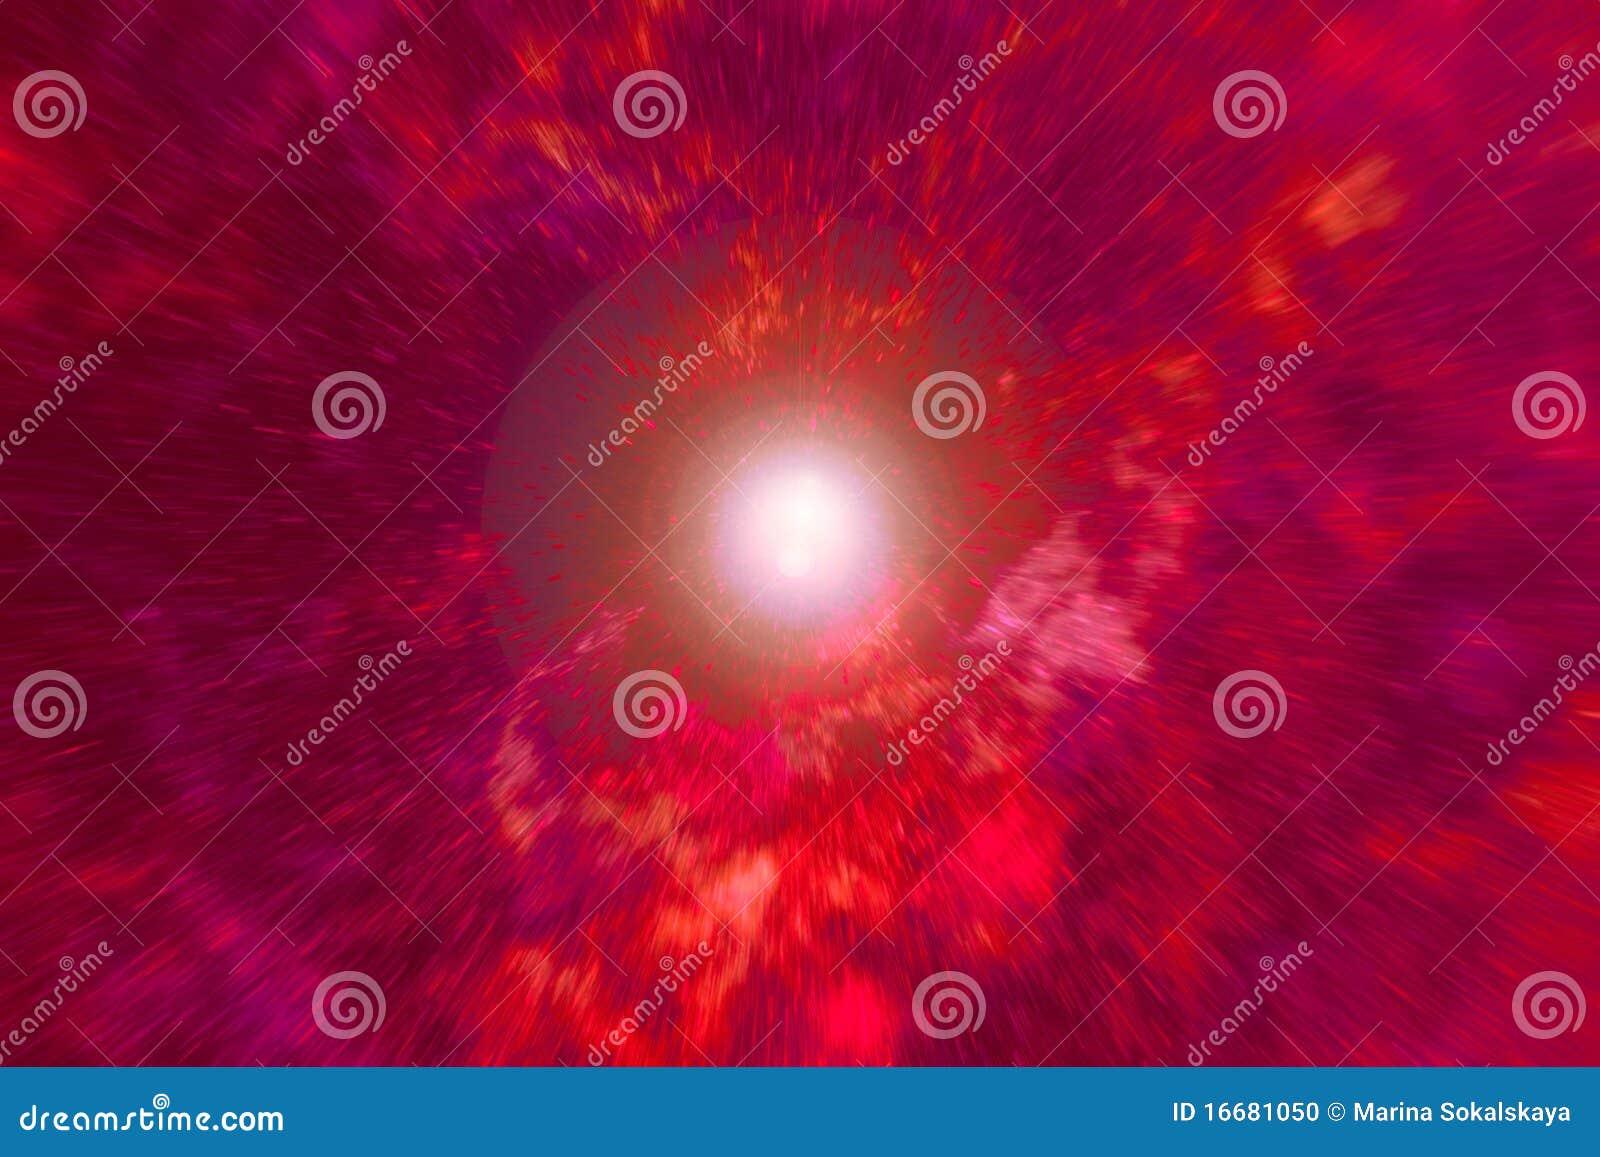 supernova landscape - photo #7